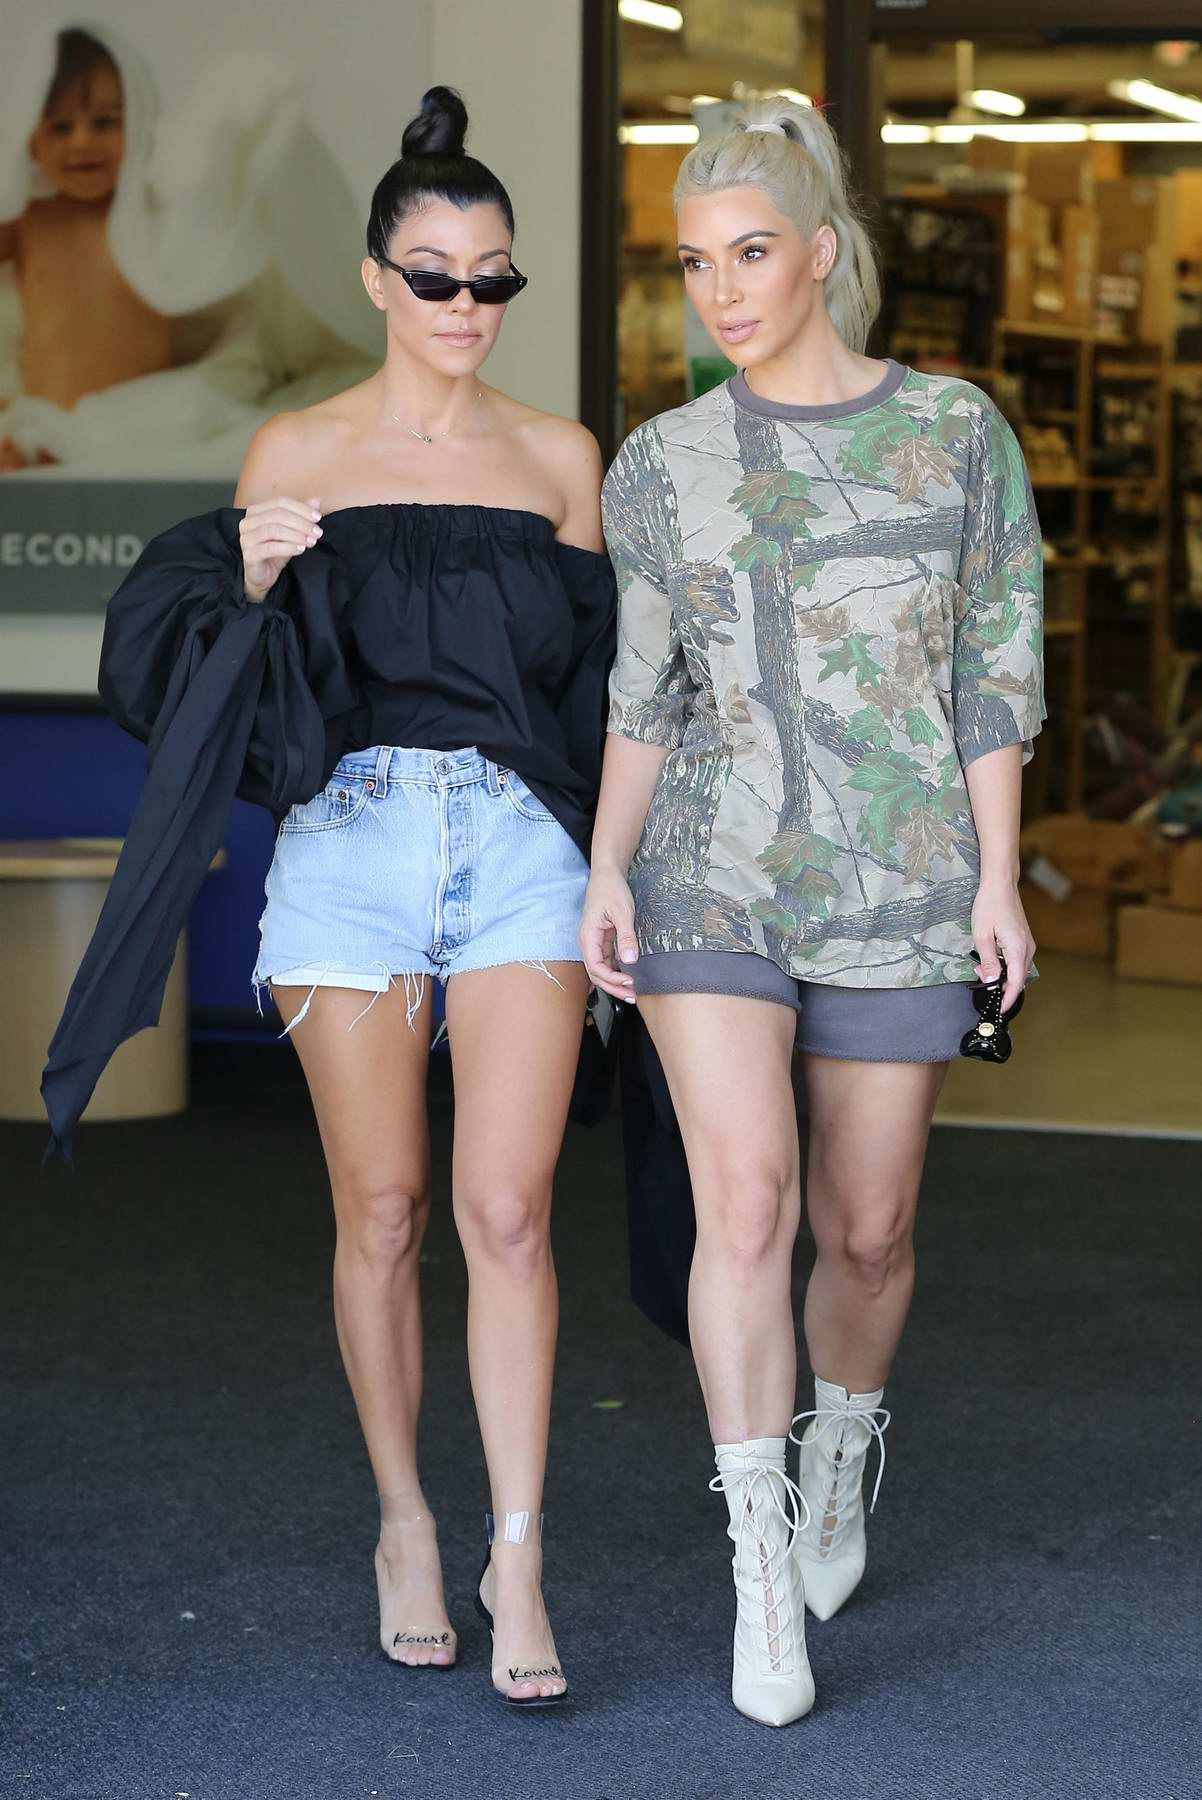 Kim Kardashian and Kourtney Kardashian go shopping at BuyBuy Baby in Calabasas, California